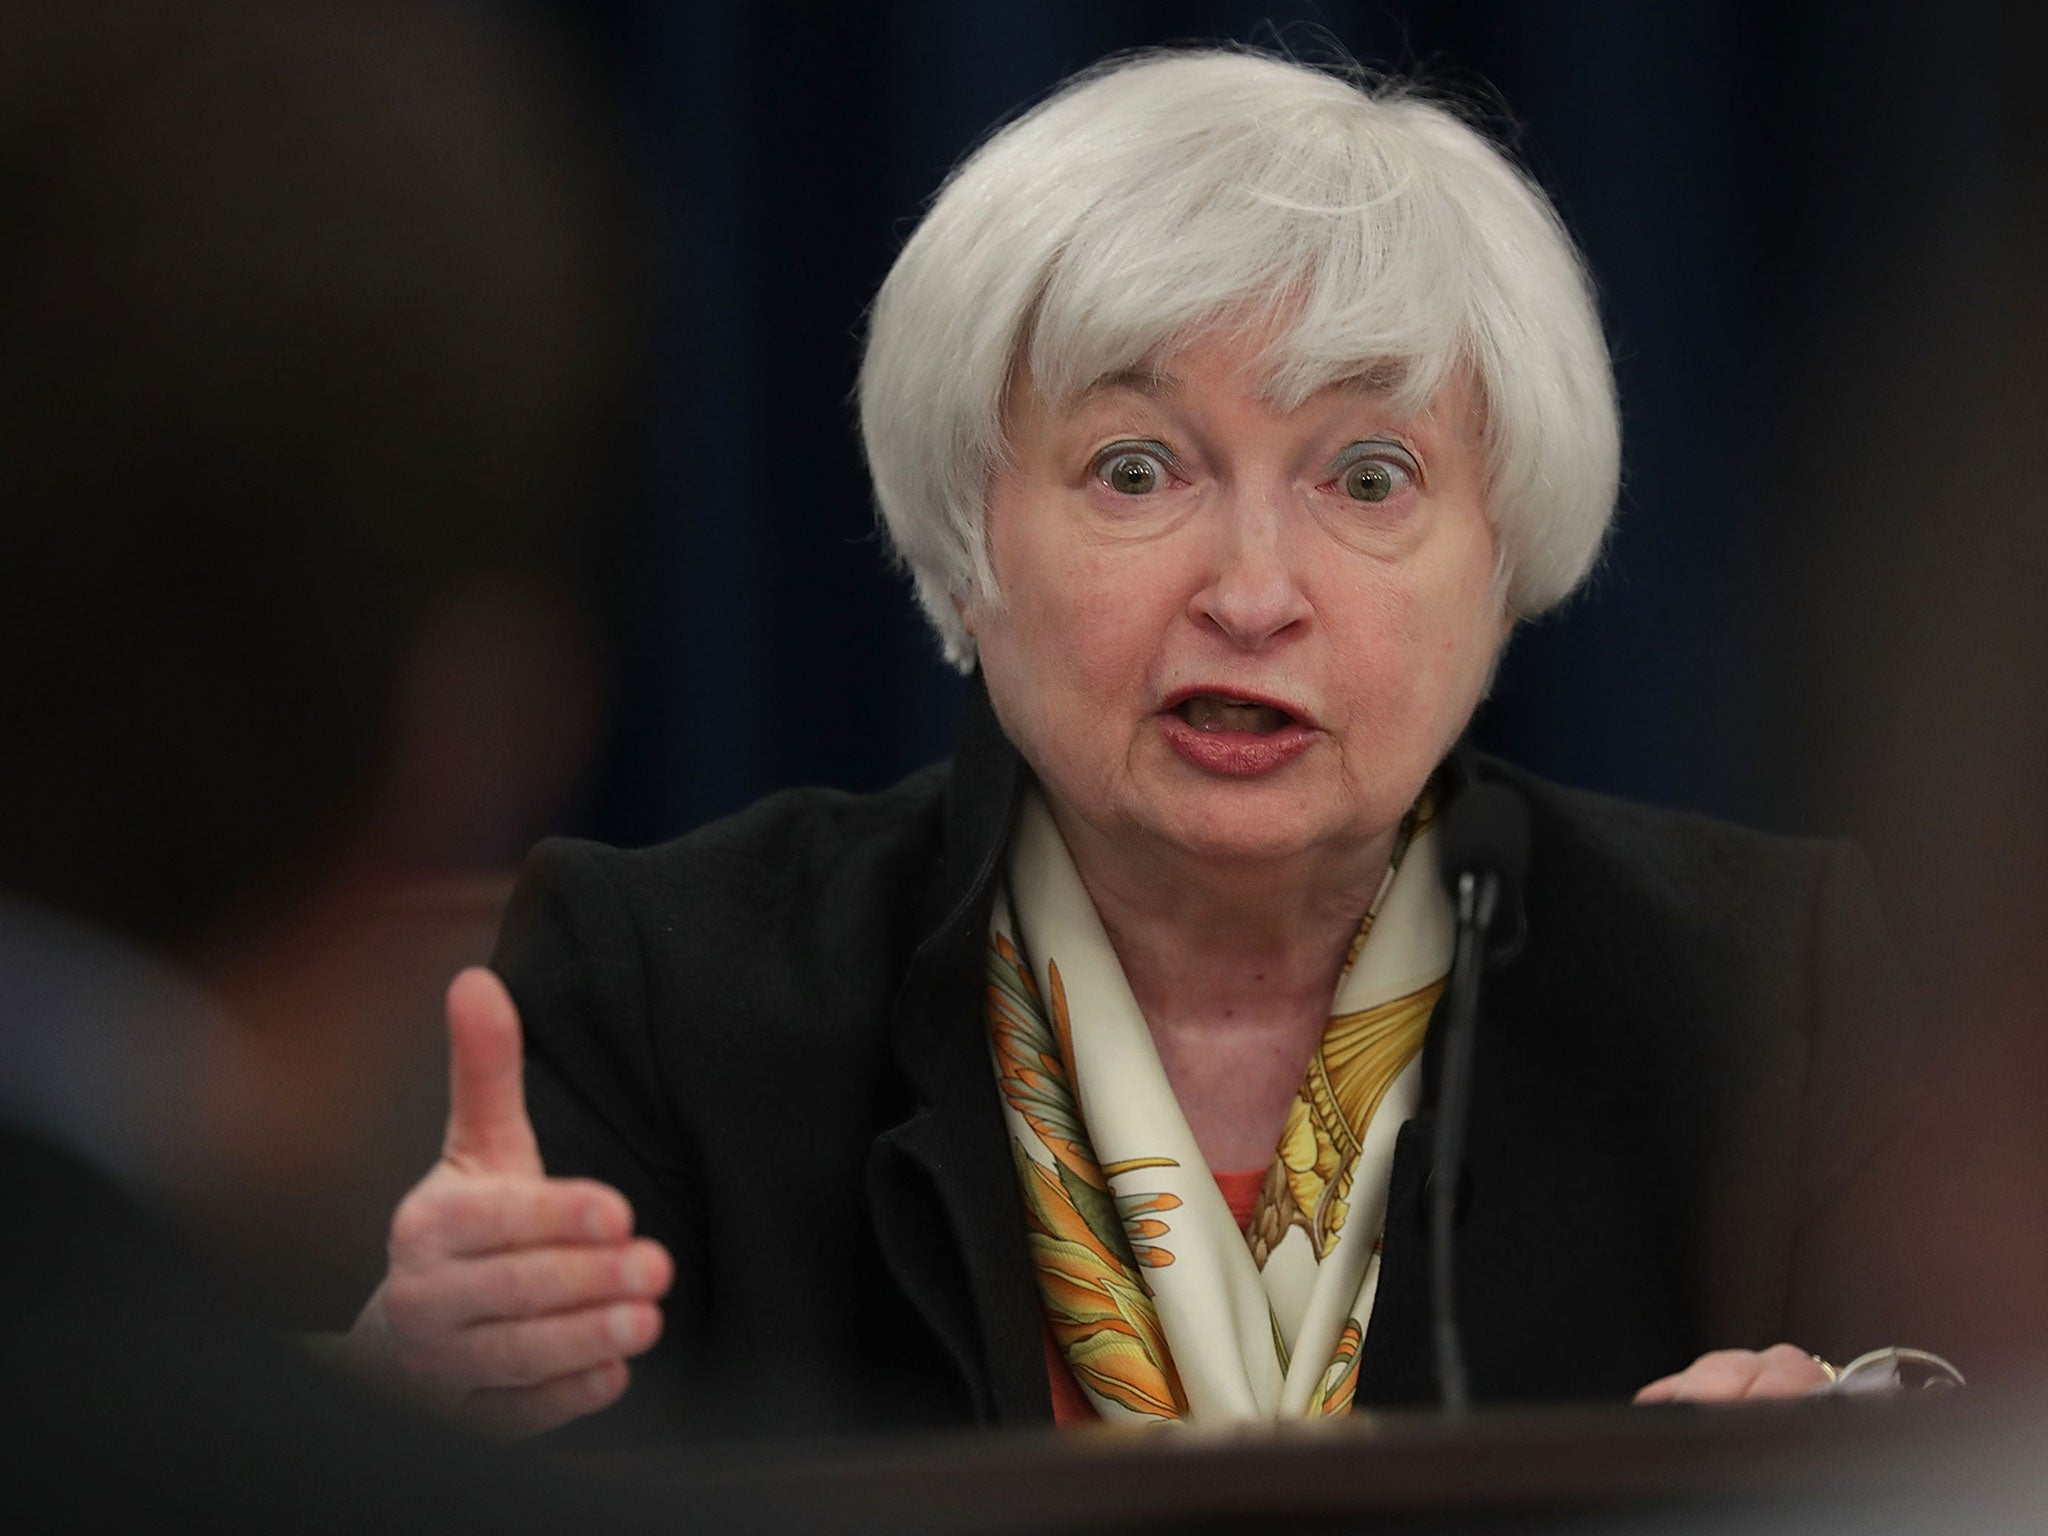 Dollar rallies on Janet Yellen's rate talk following Donald Trump slump